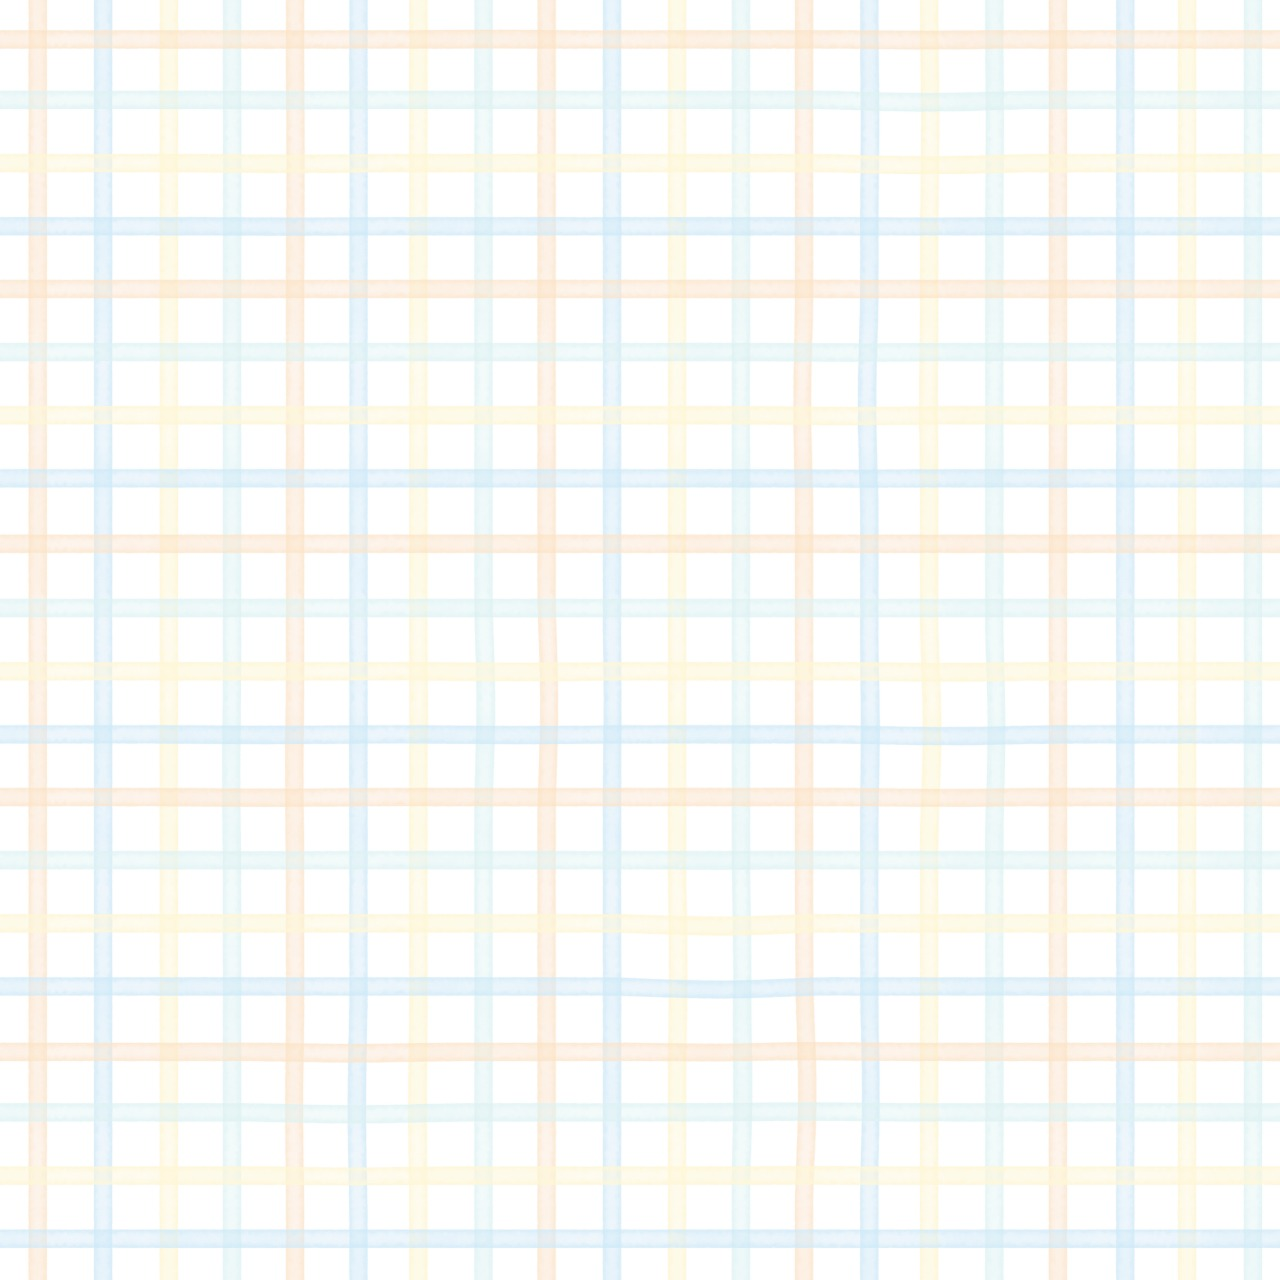 Papel de Parede Quadriculado Didi - Colorido